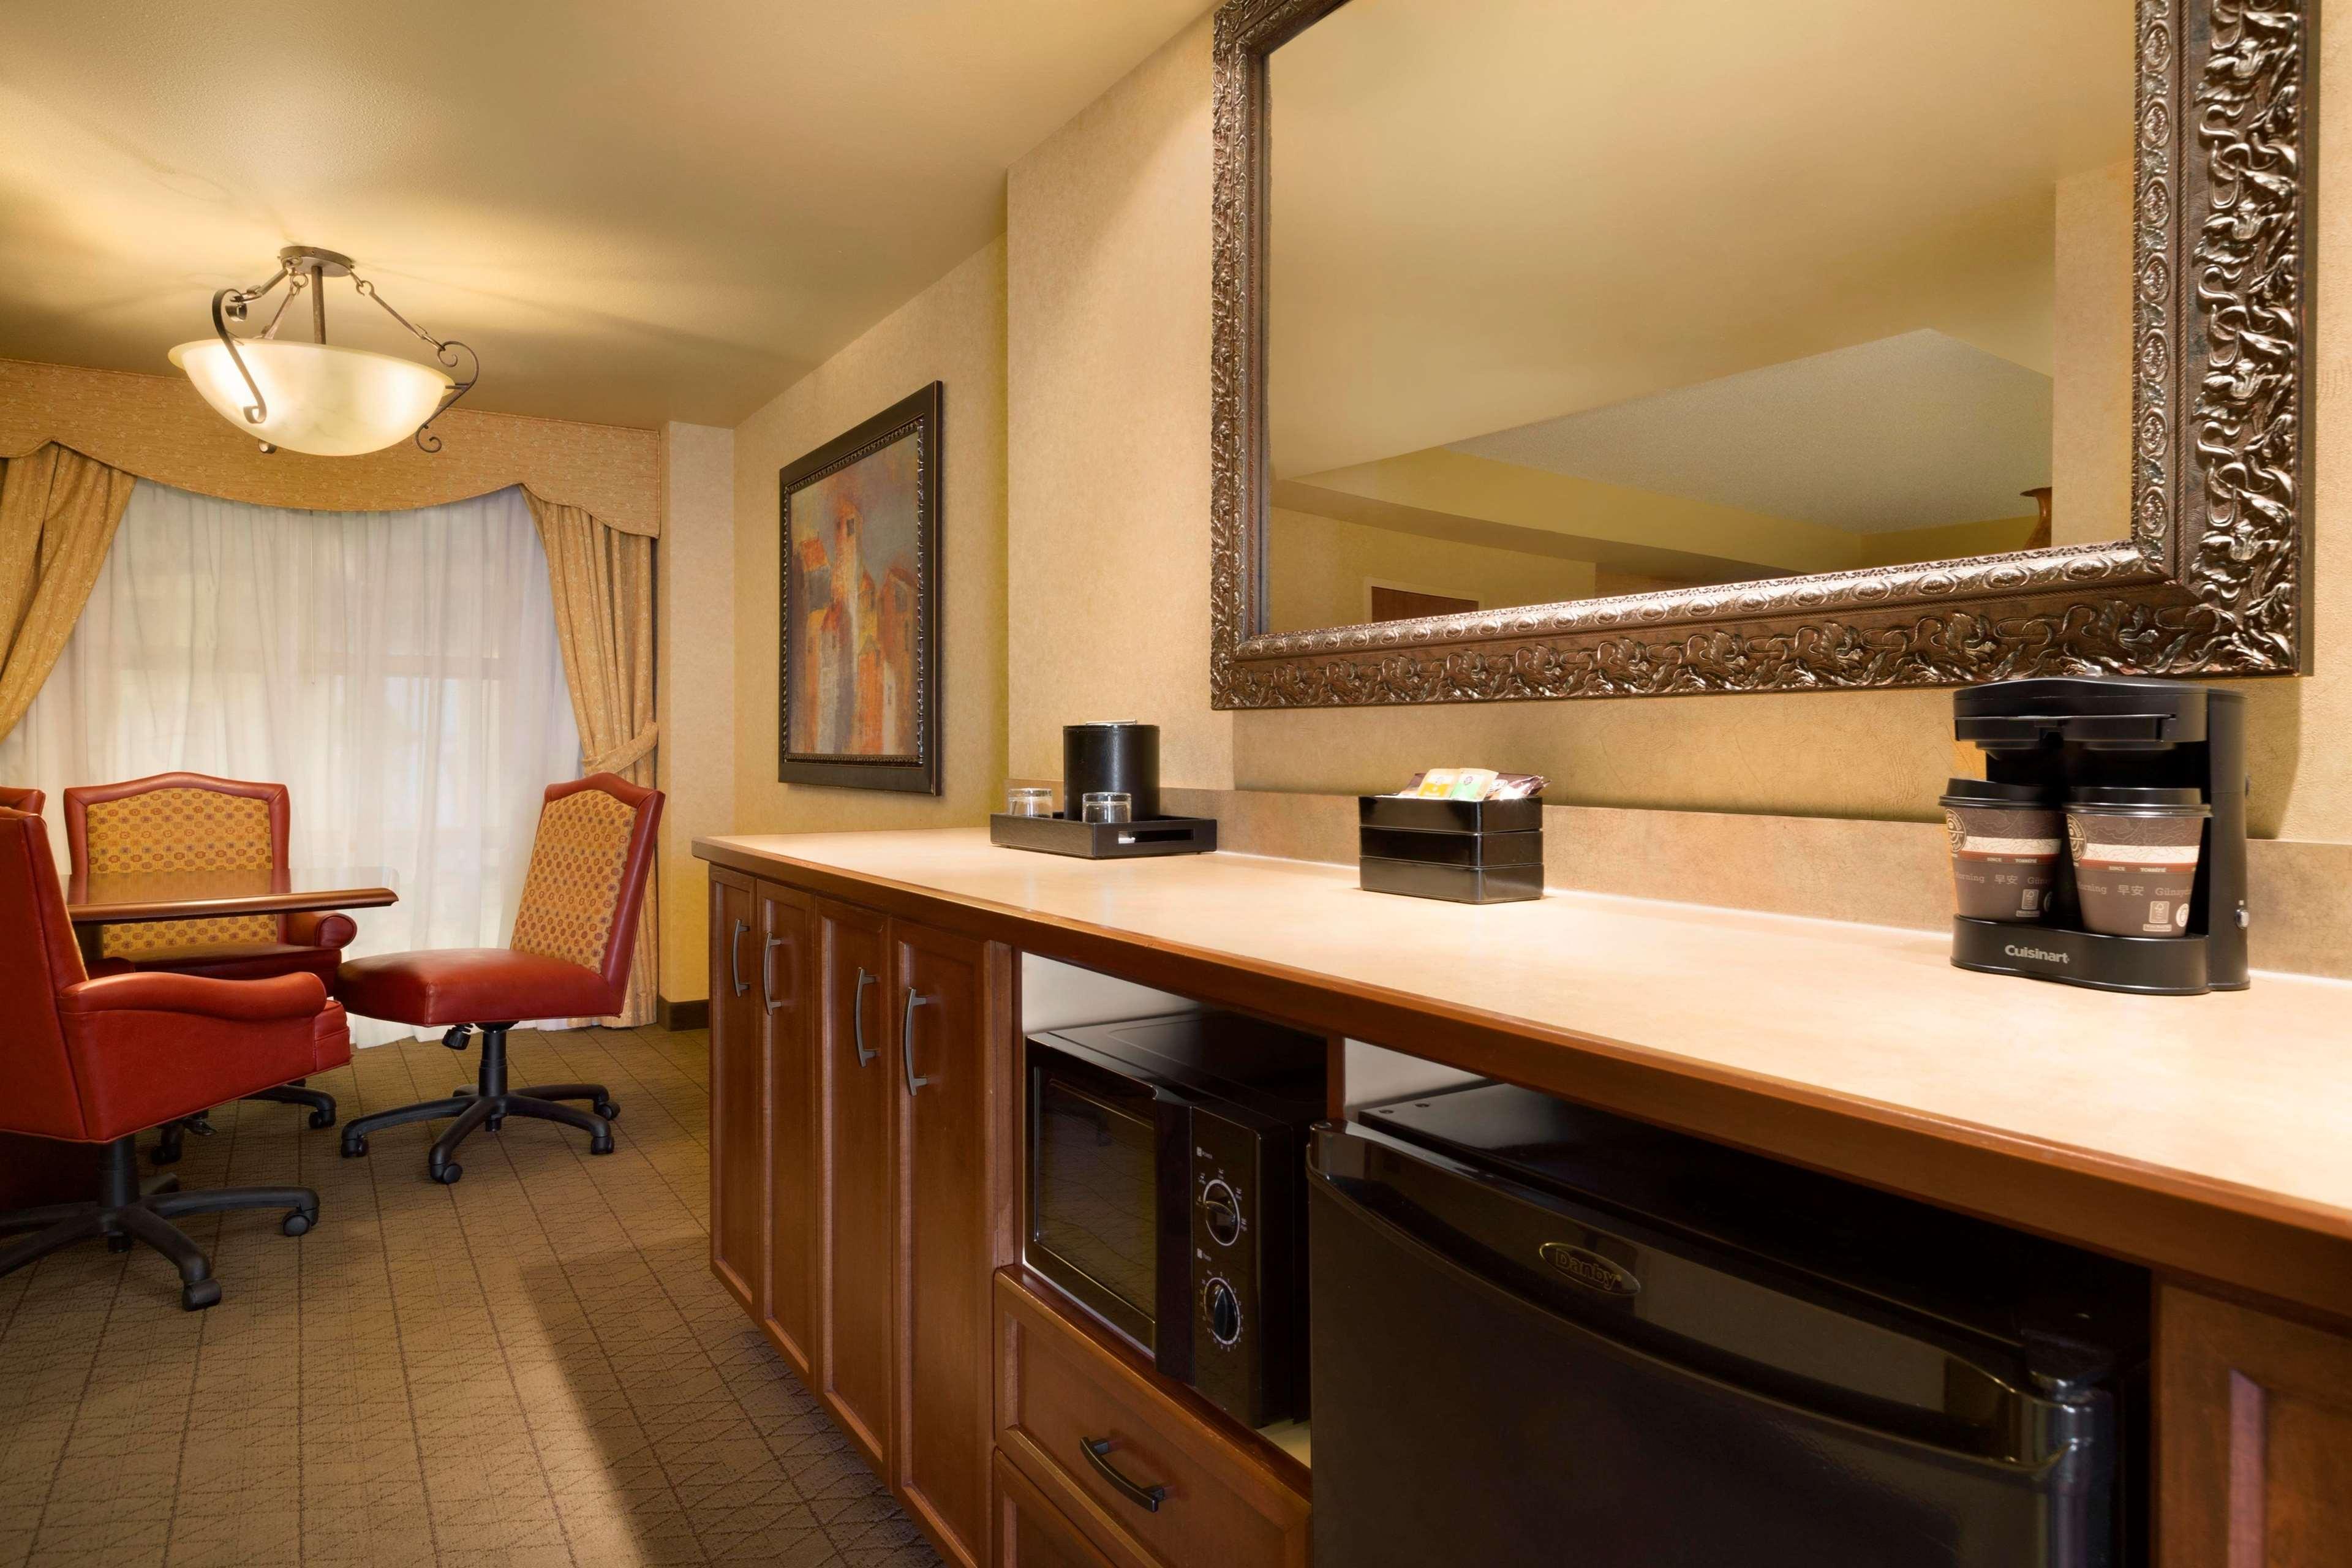 Embassy Suites by Hilton Albuquerque Hotel & Spa image 30